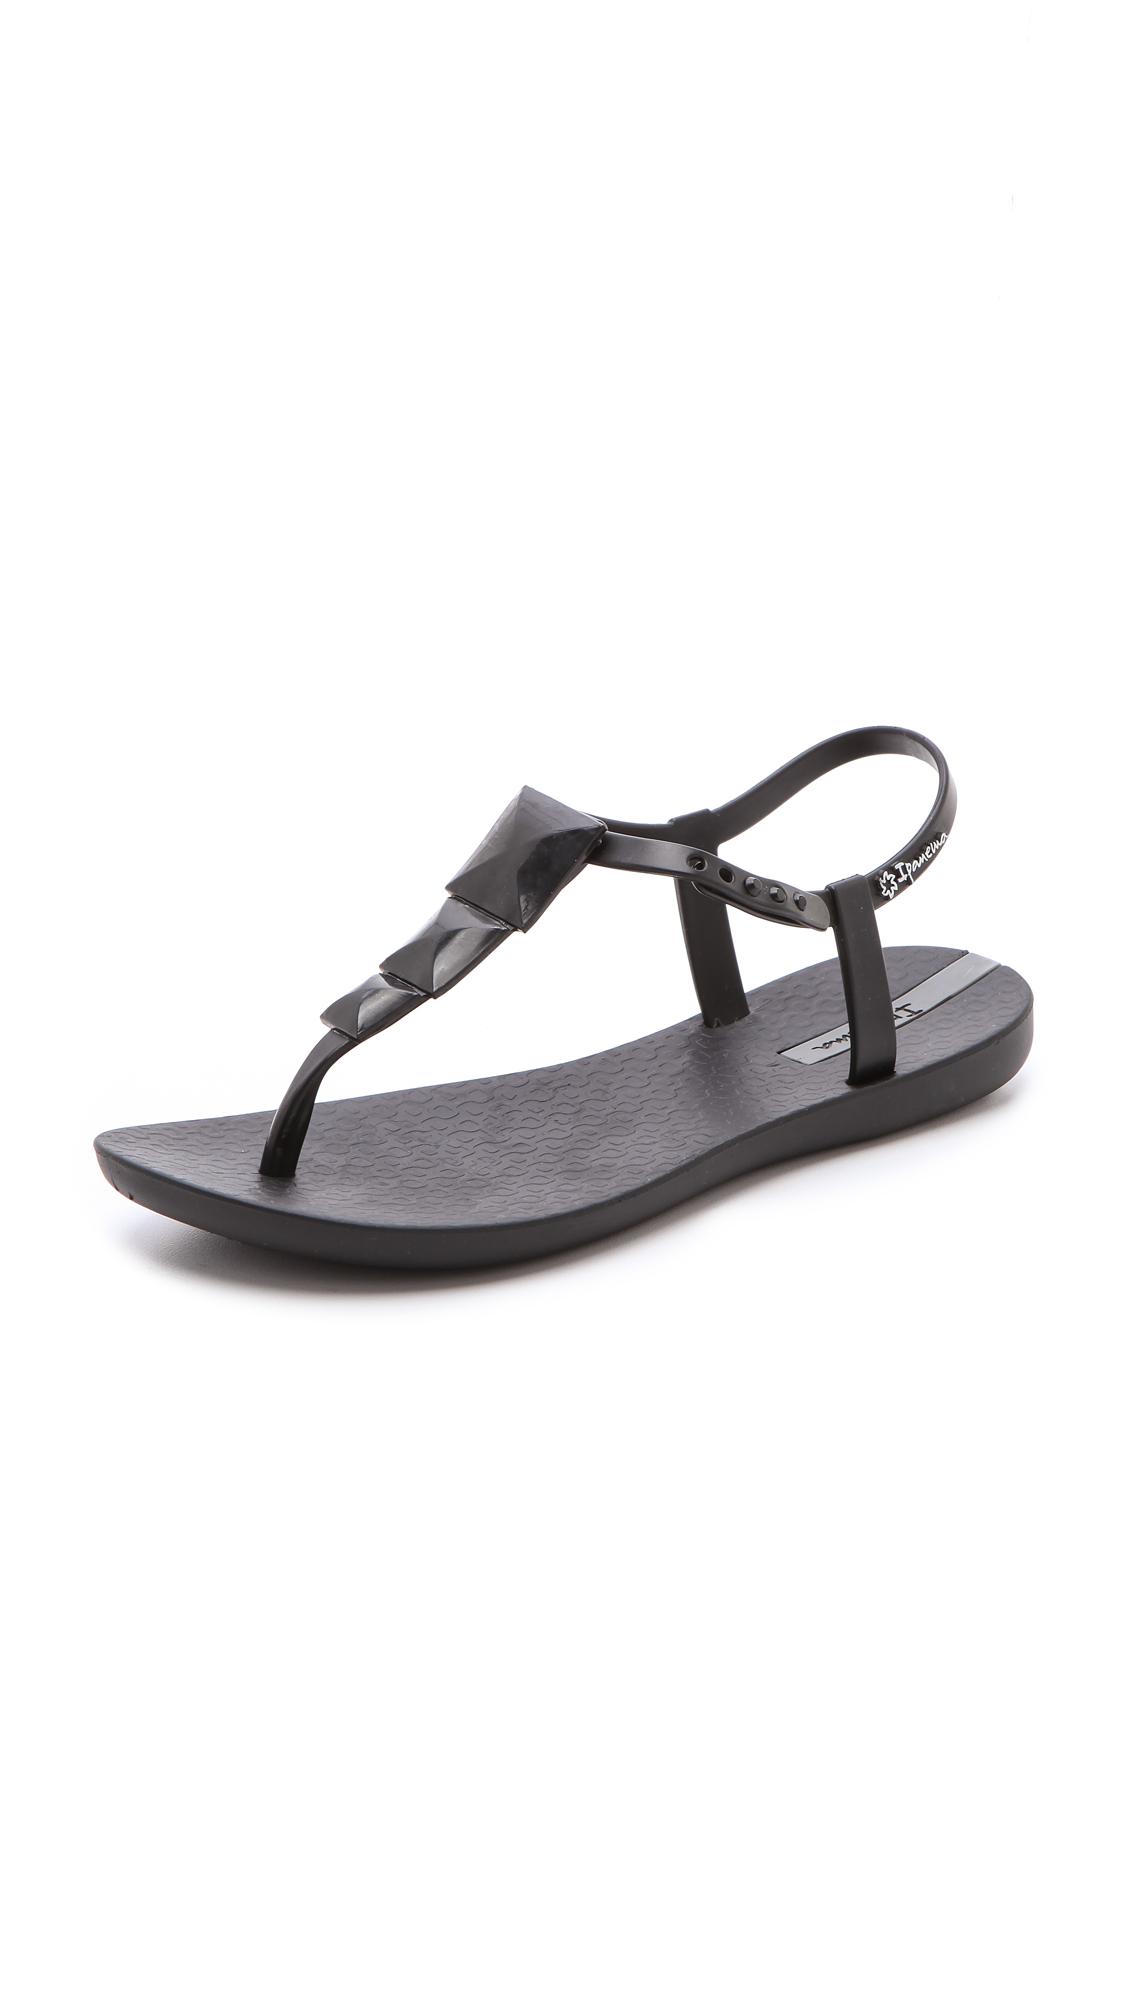 b01028195af624 Ipanema Maya Studded Rubber Sandals